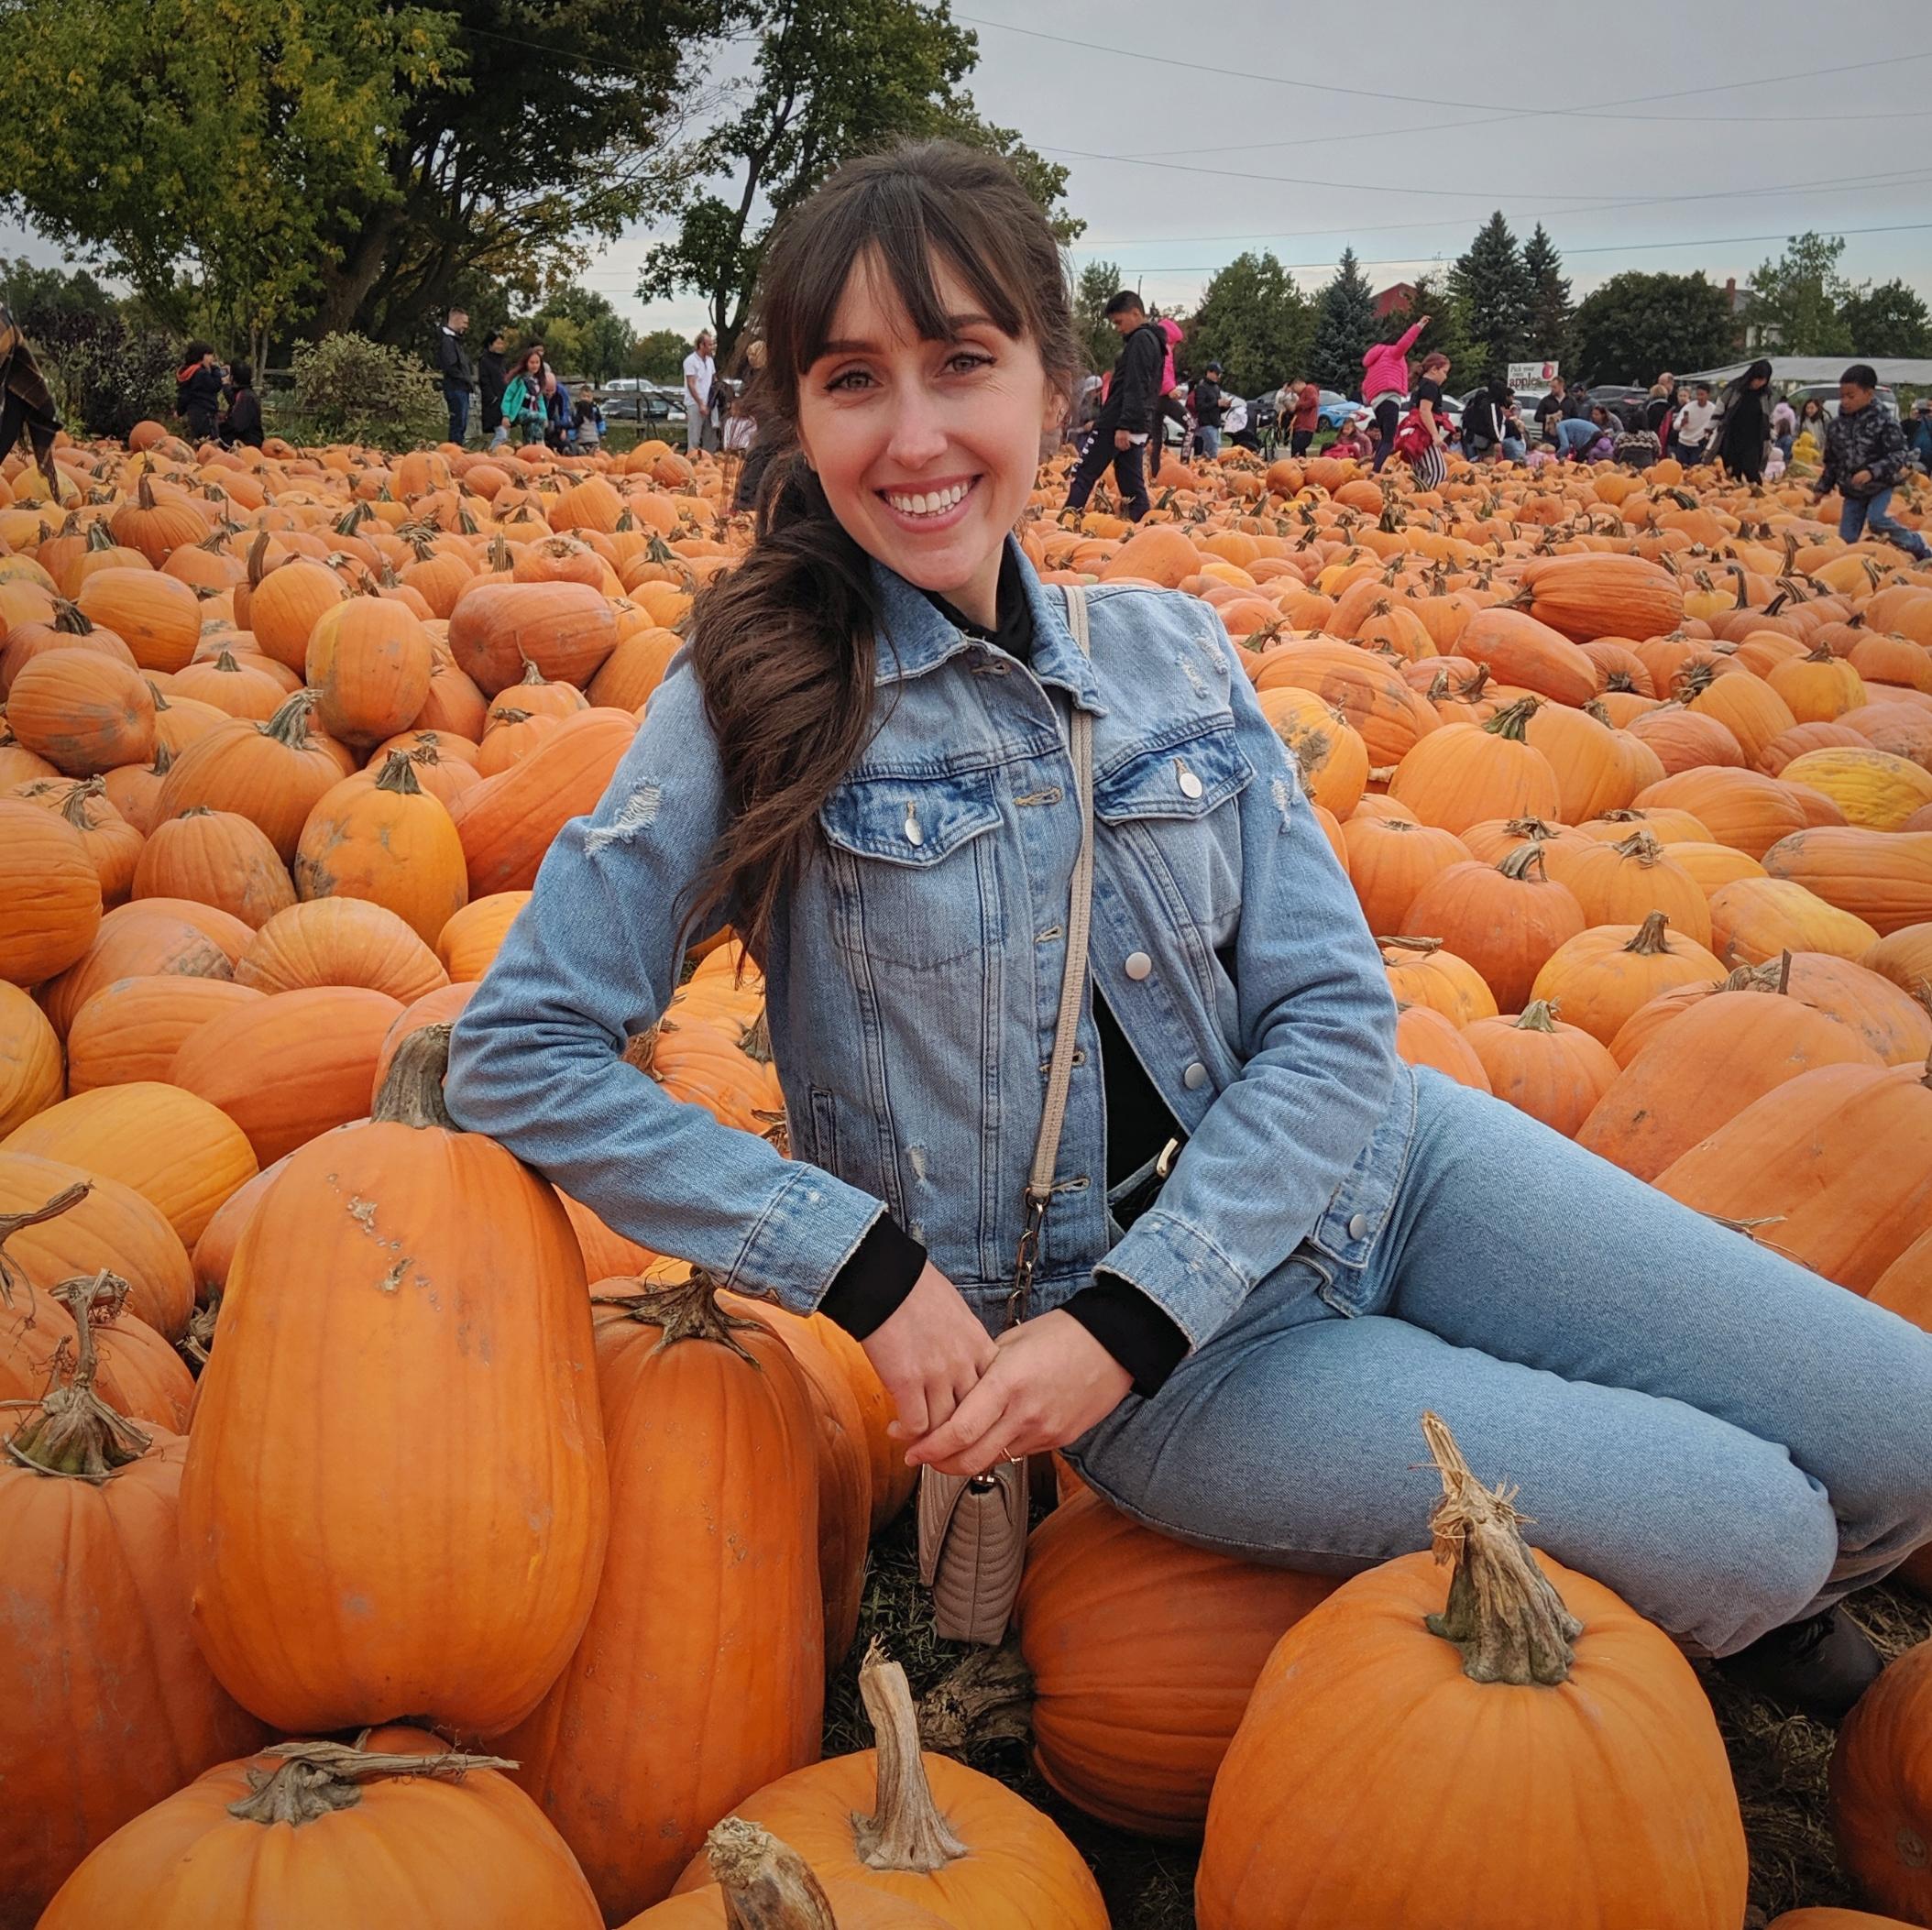 amanda orlando pumpkin patch ontario downeys farm